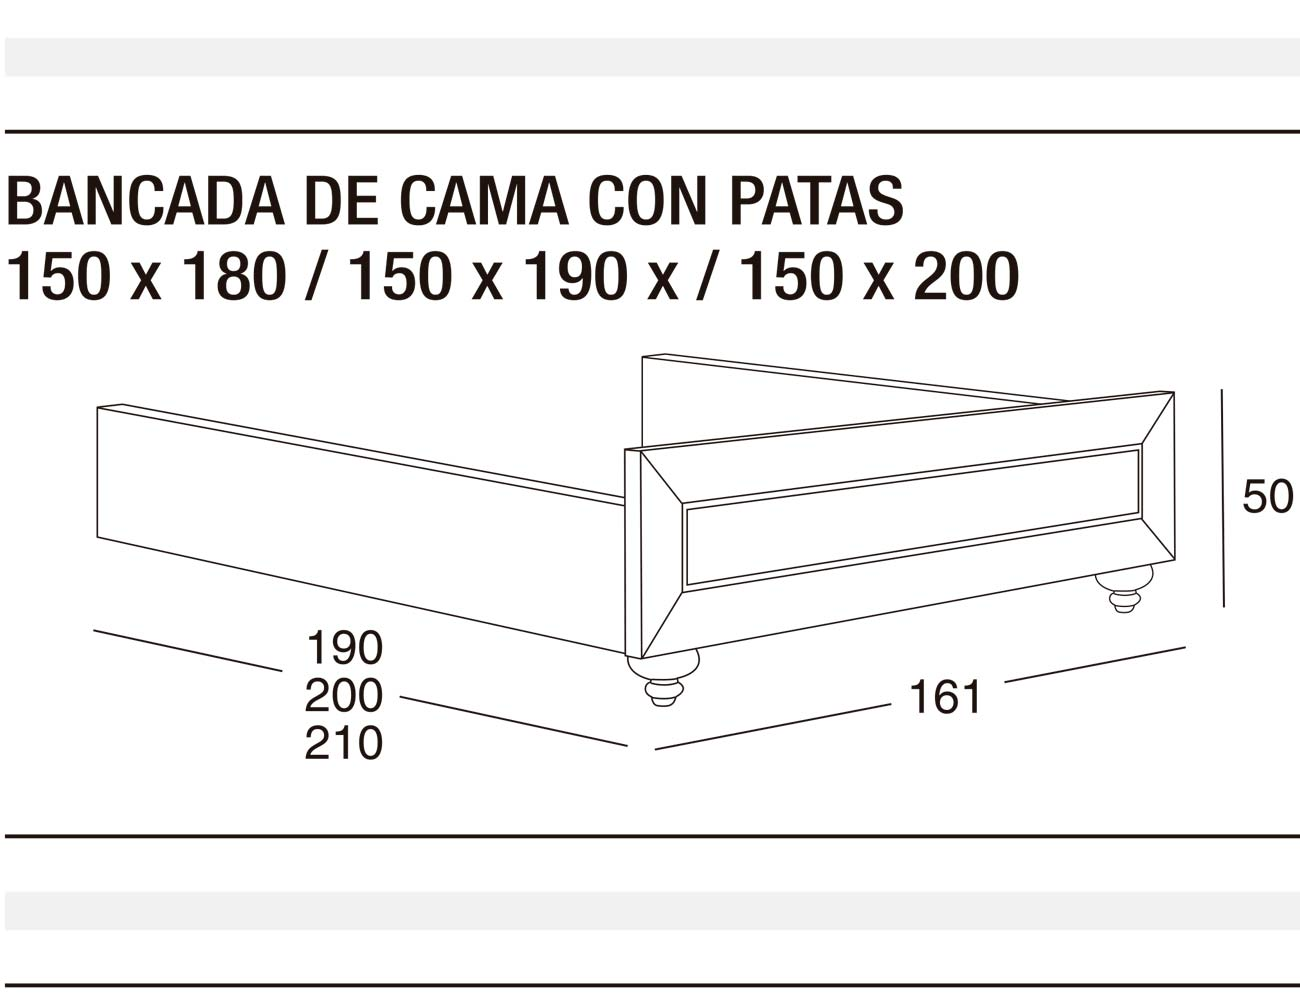 Bancada cama p 150x180 150x190 150x200